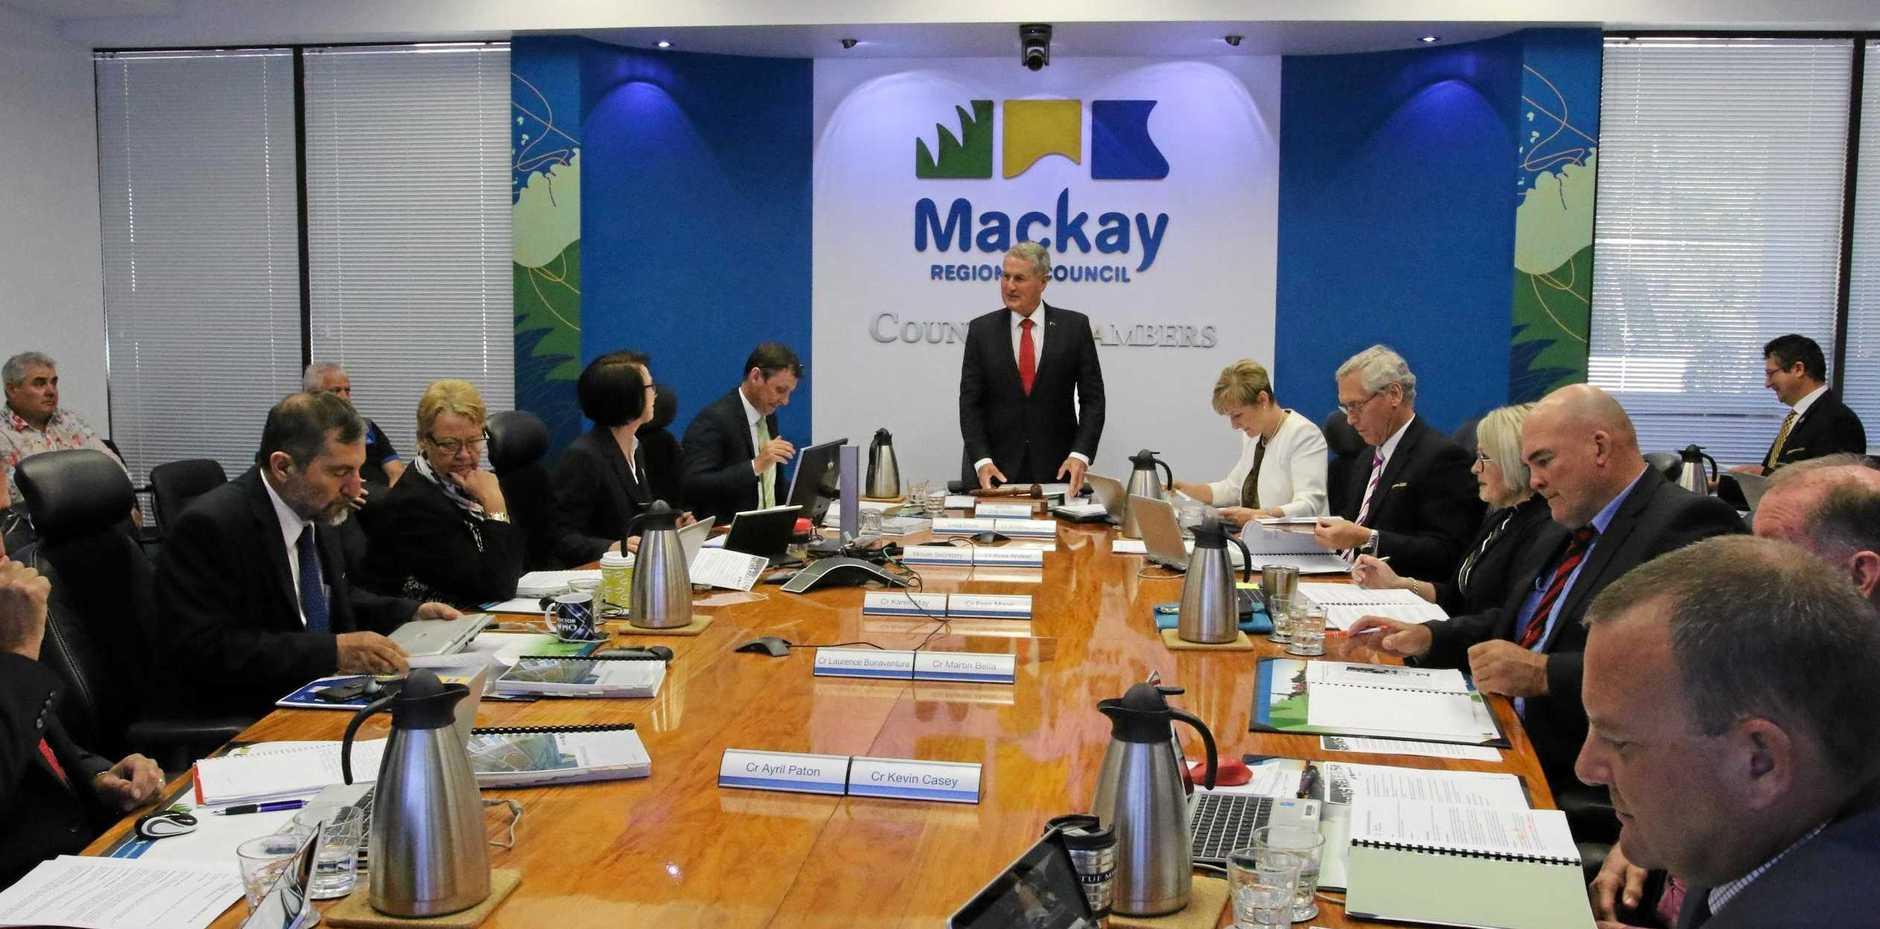 Mackay Regional Council's 2019 budget meeting.